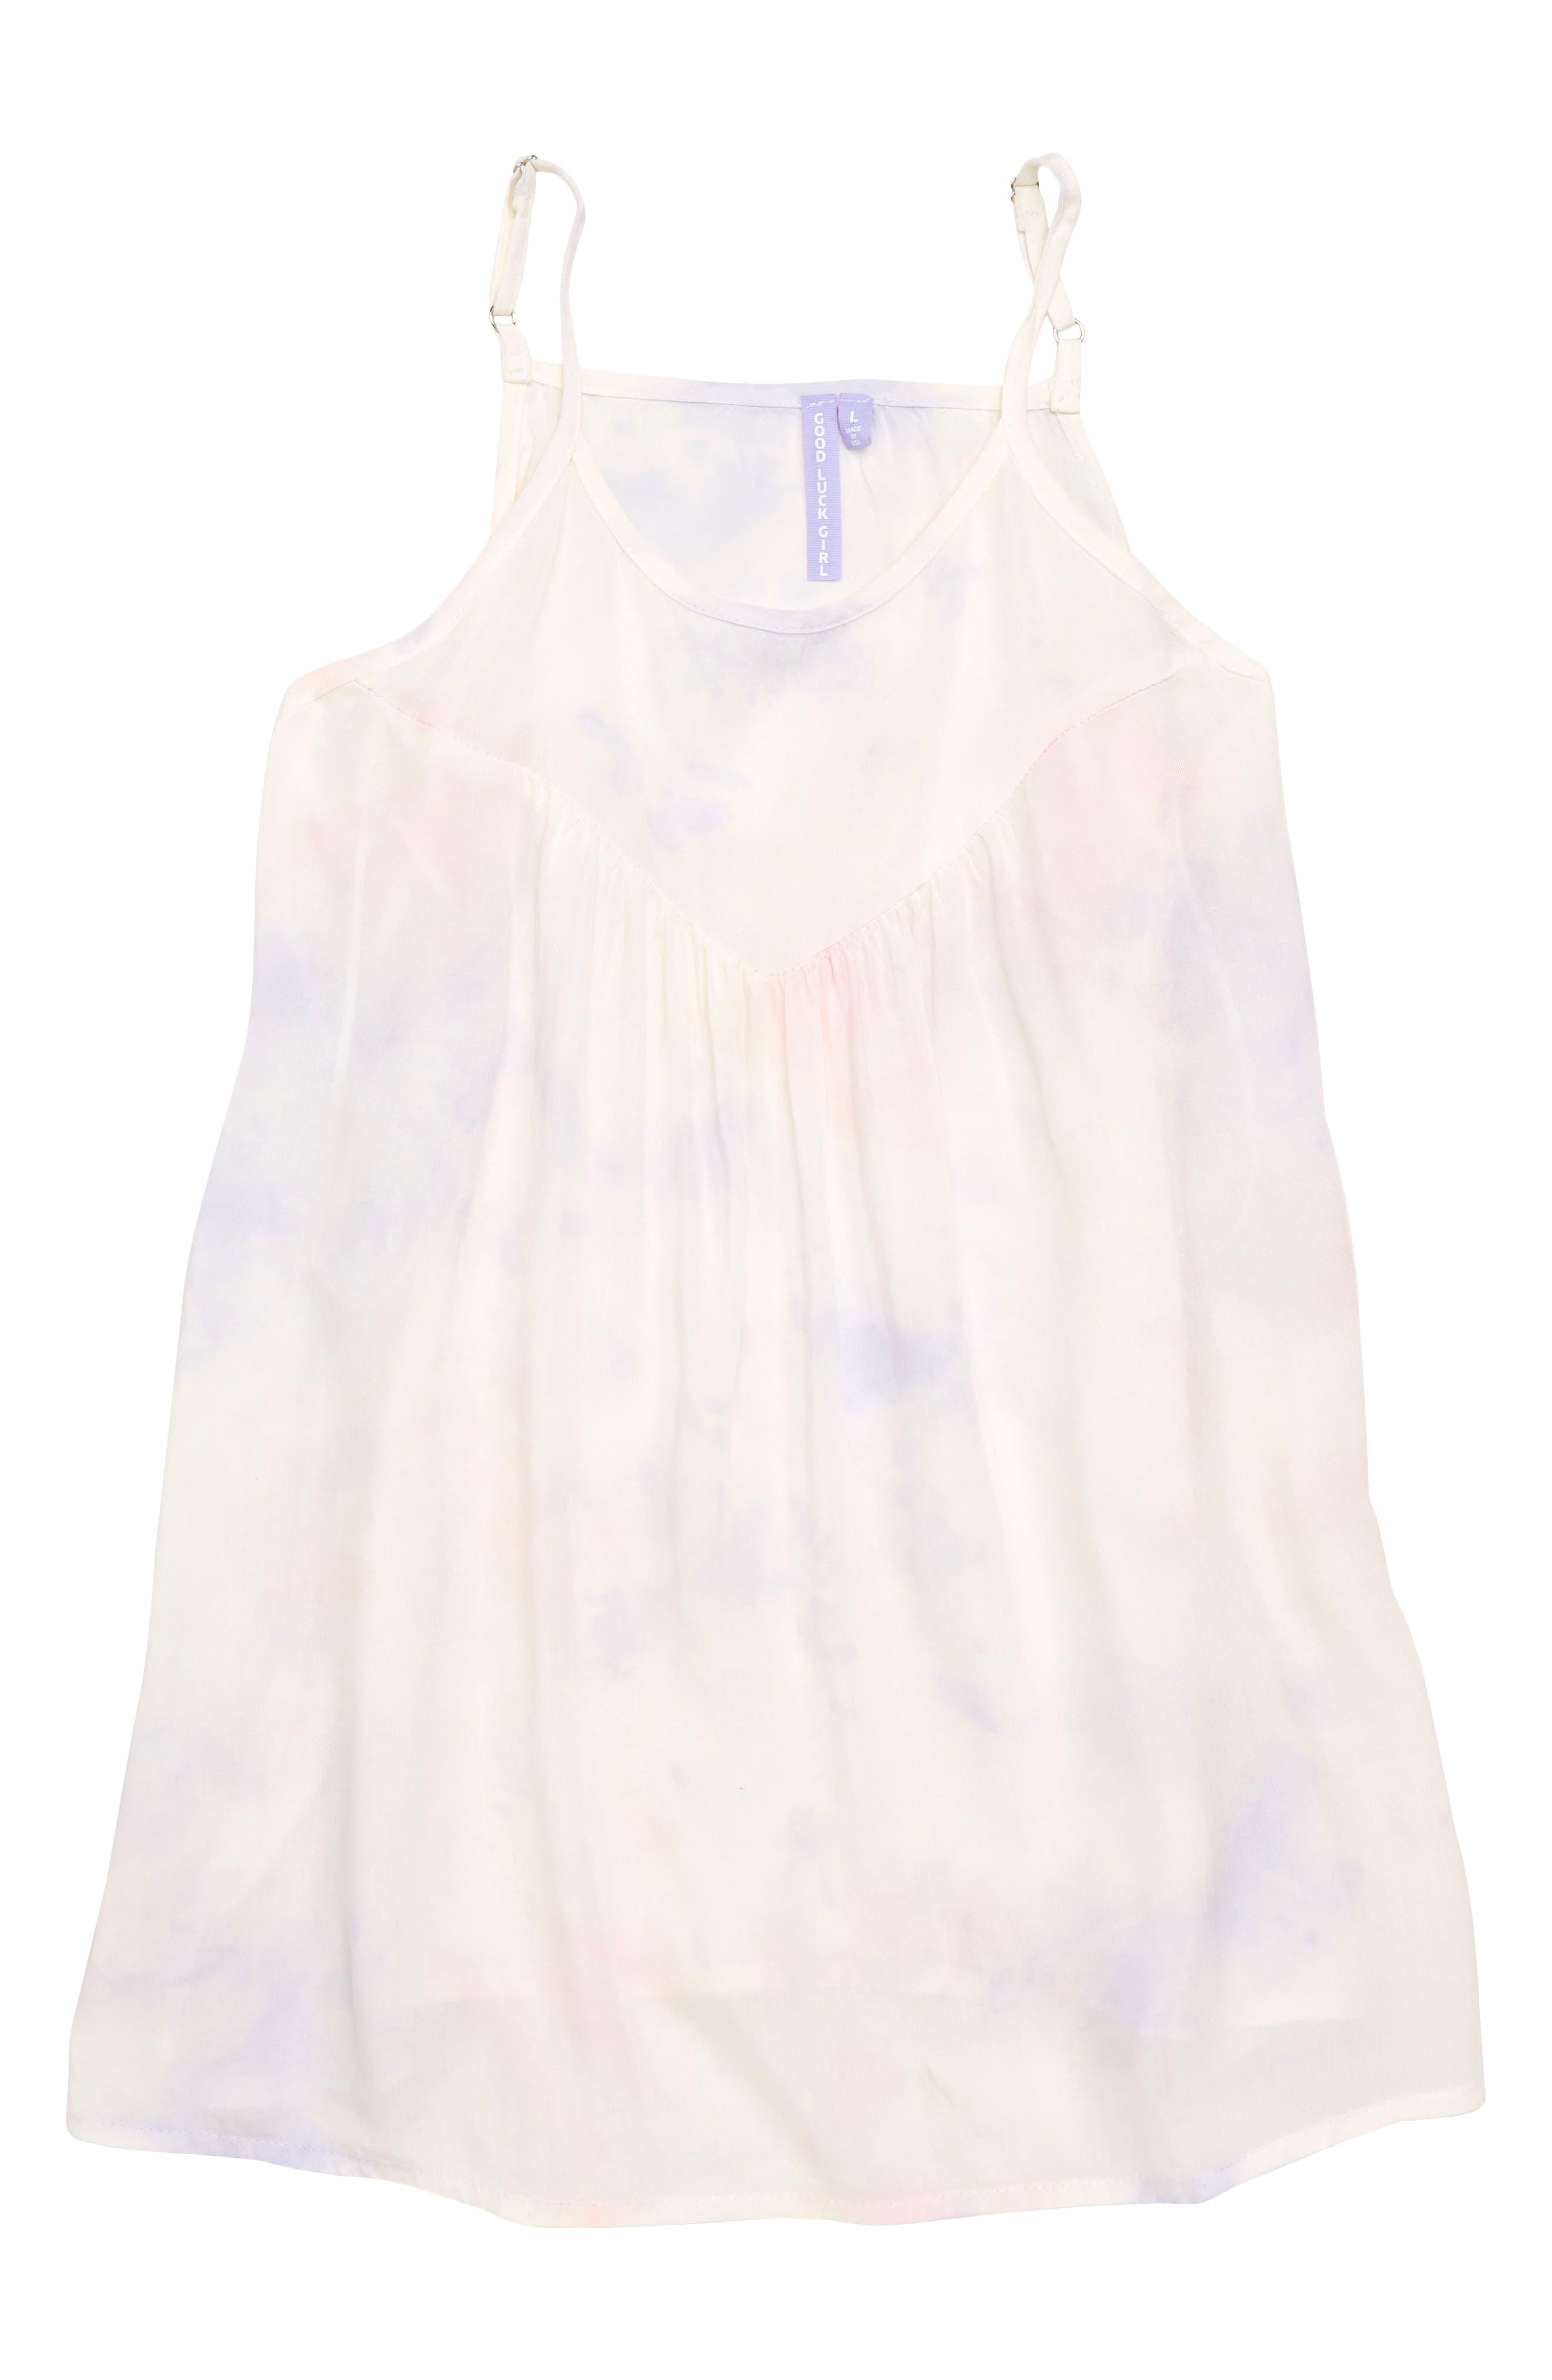 Crystal Tie Dye Swing Tank,                             Main thumbnail 1, color,                             100